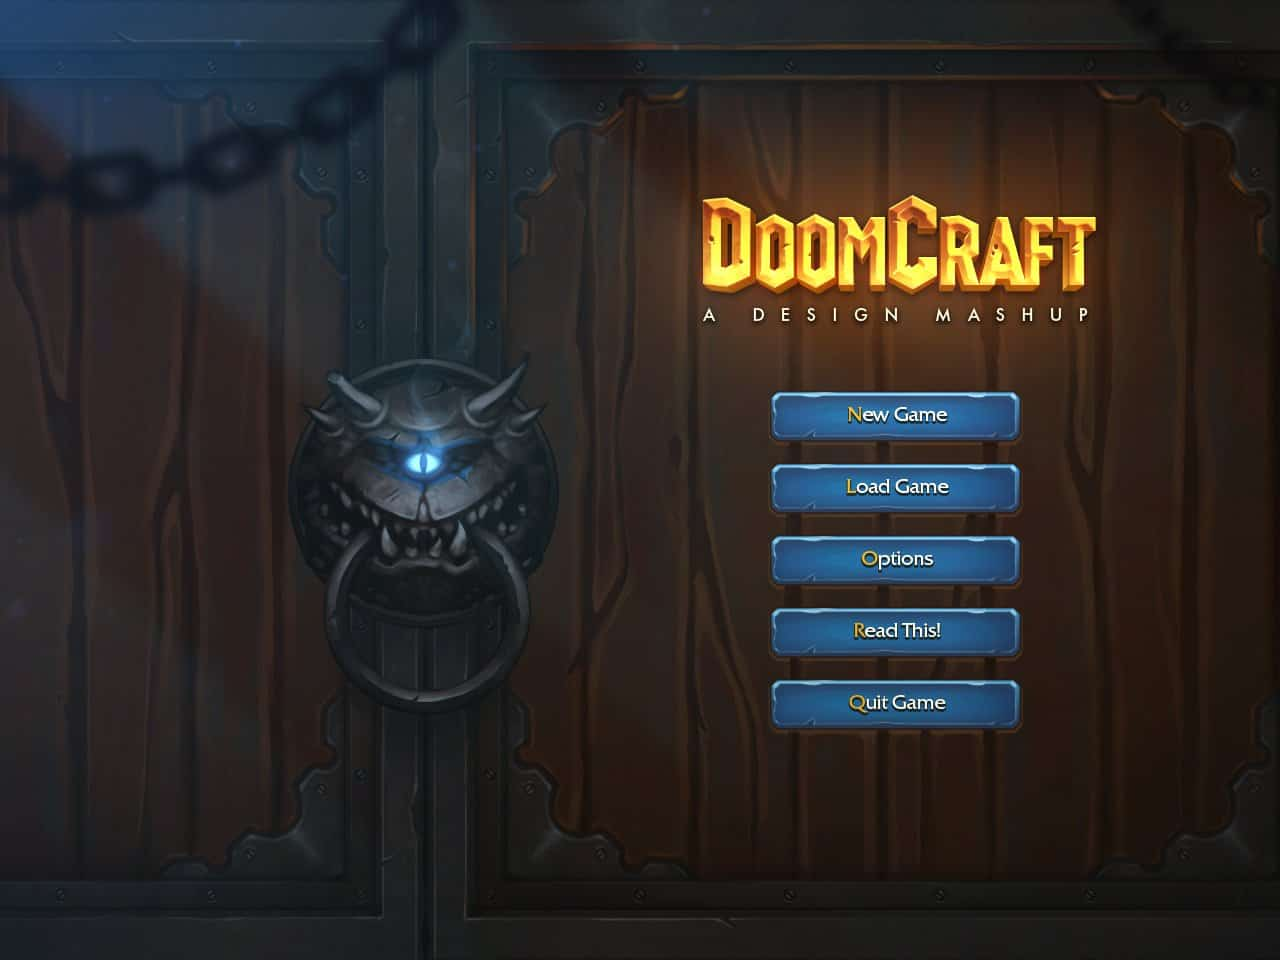 Warcraft Gets The Doom Treatment In DoomCraft: A Design Mashup 1